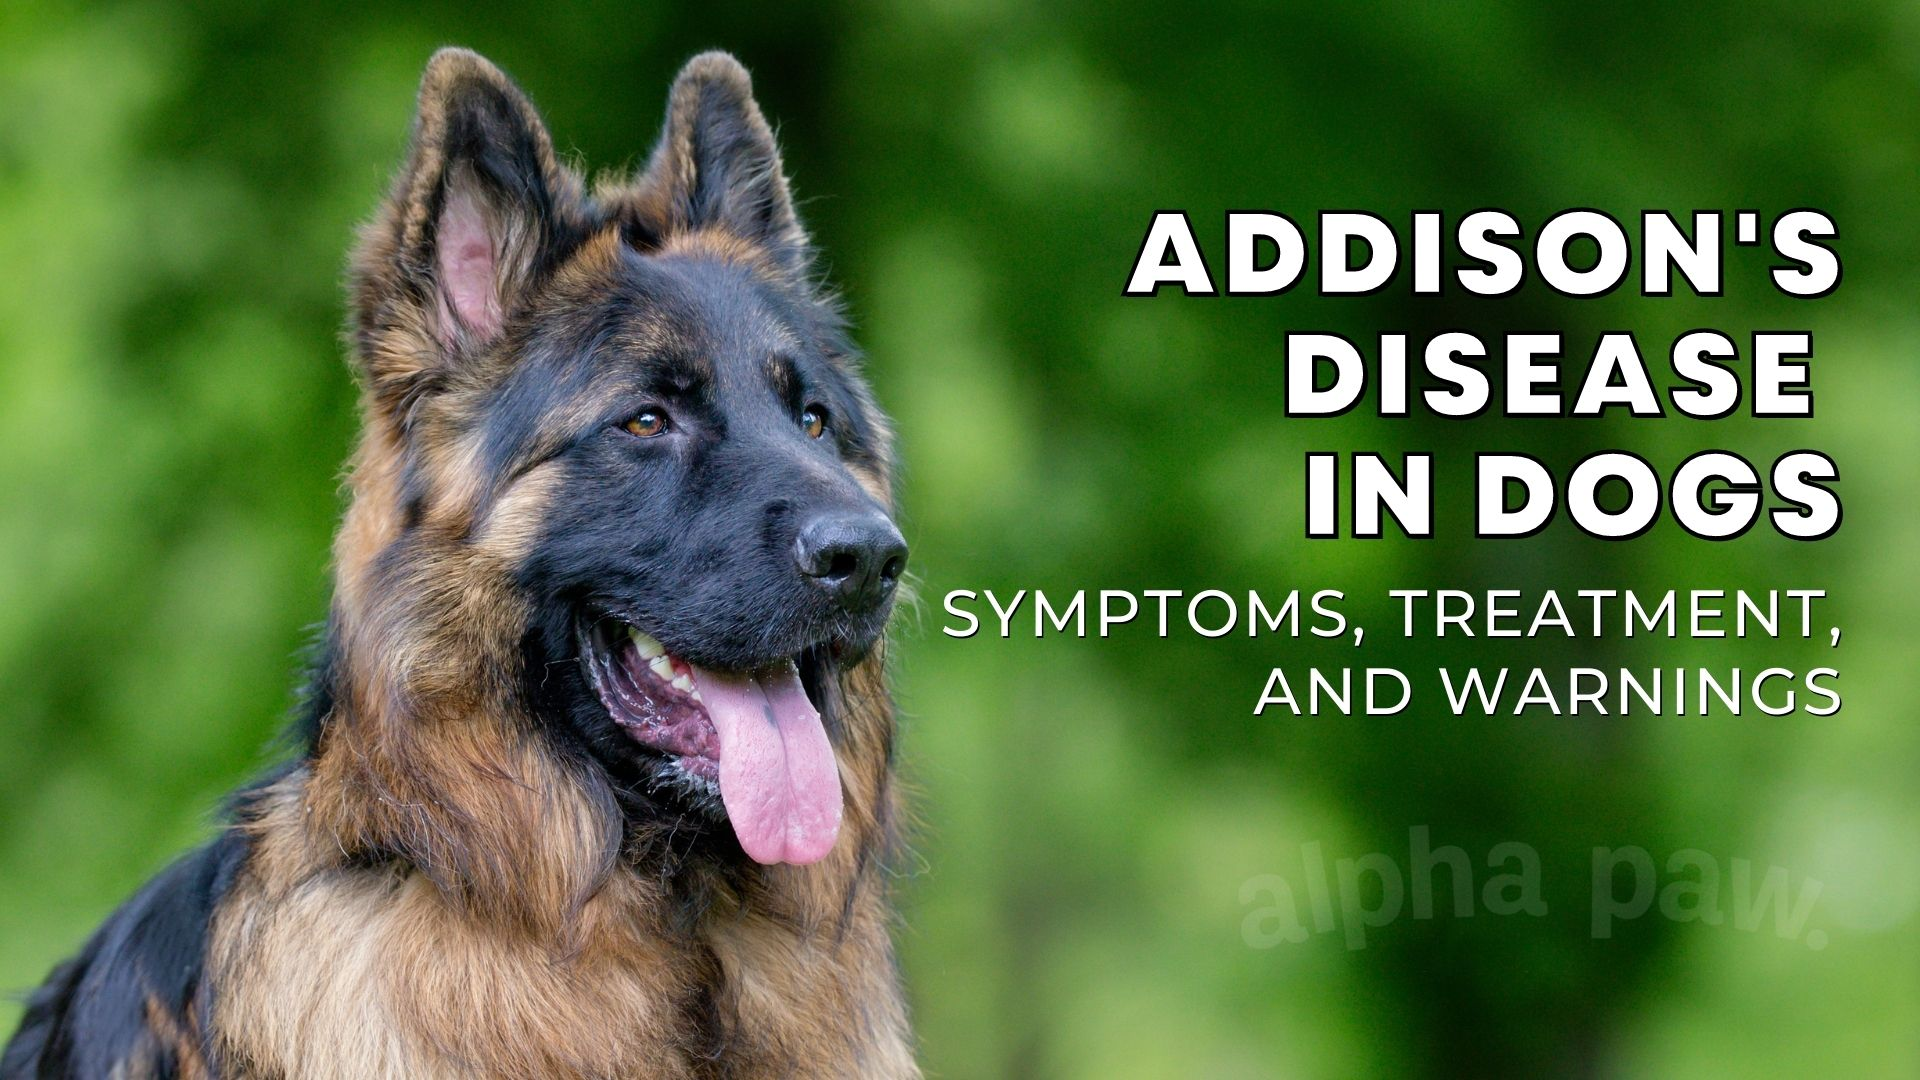 Addison's Disease in Dogs: Symptoms, Treatment & Prevention